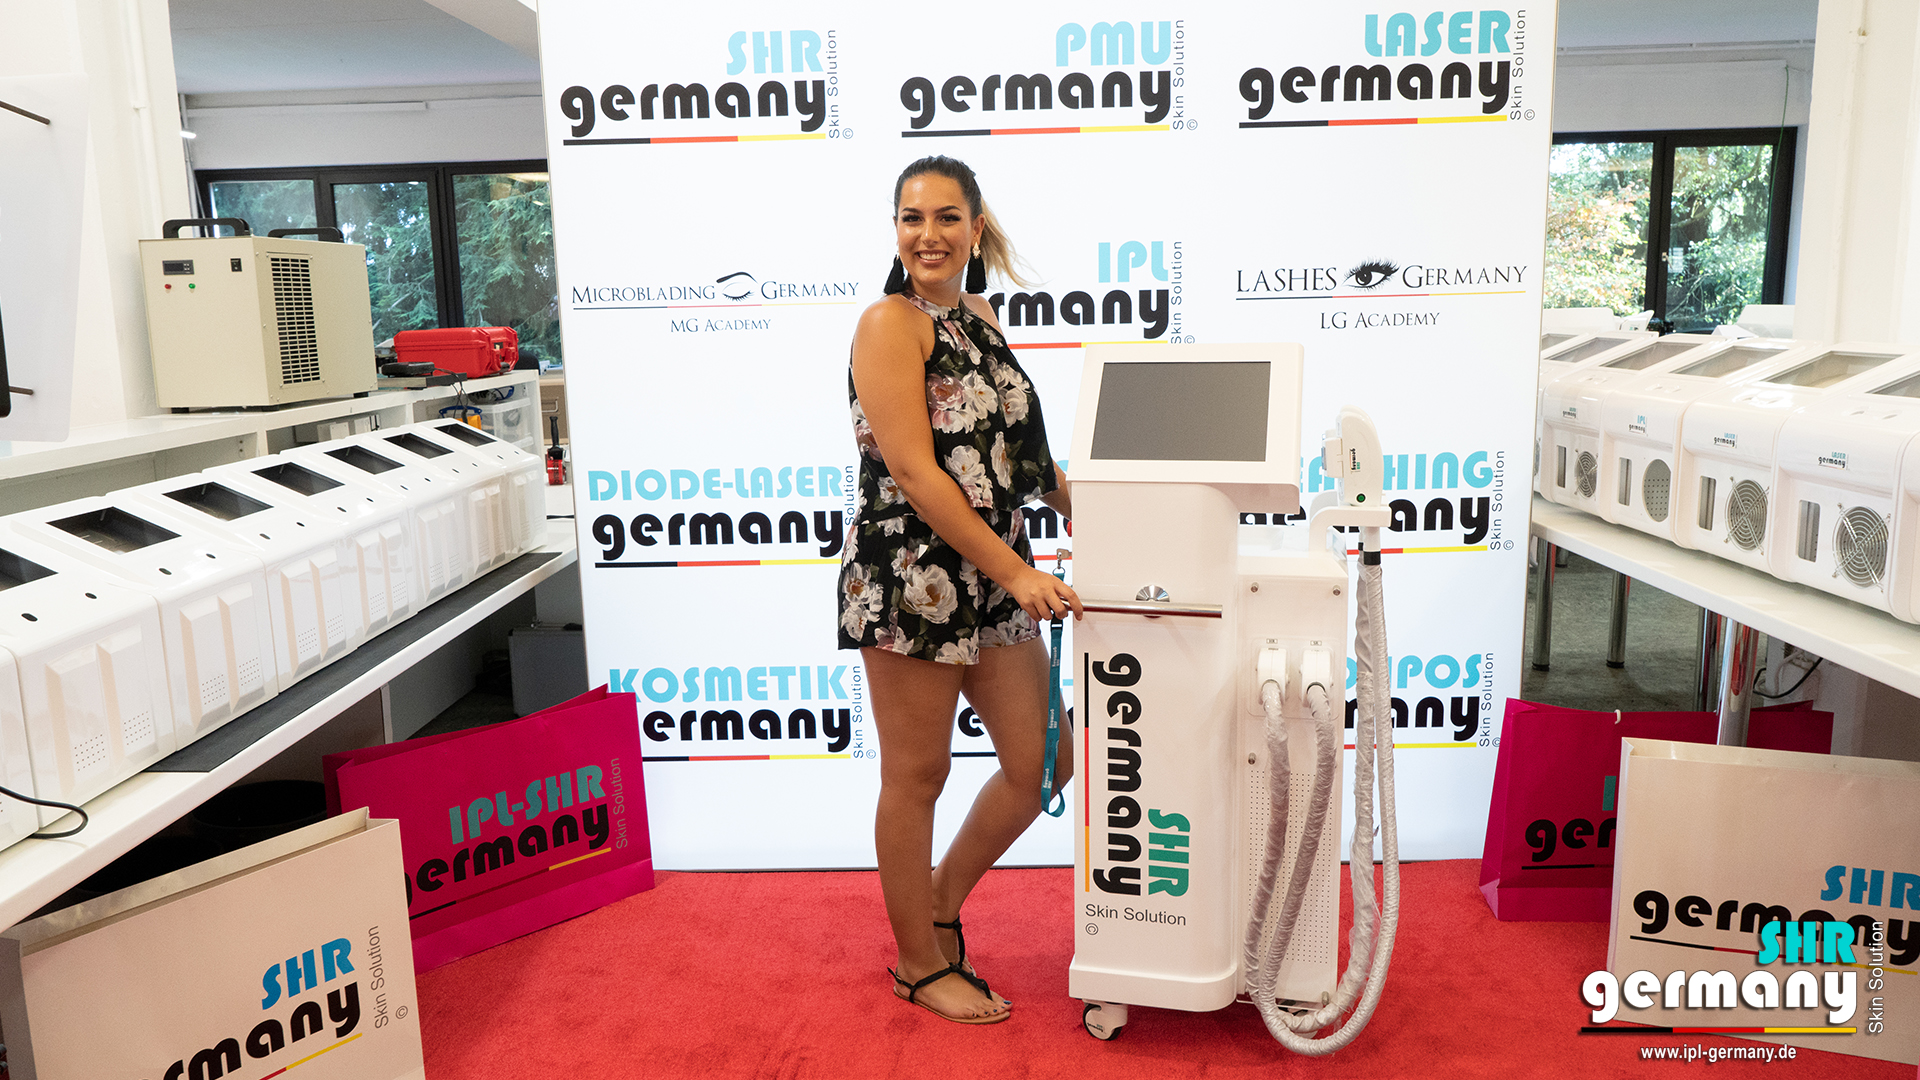 SHR_GERMANY_IPL_2018-08-04_SHR-IPL-HM_33